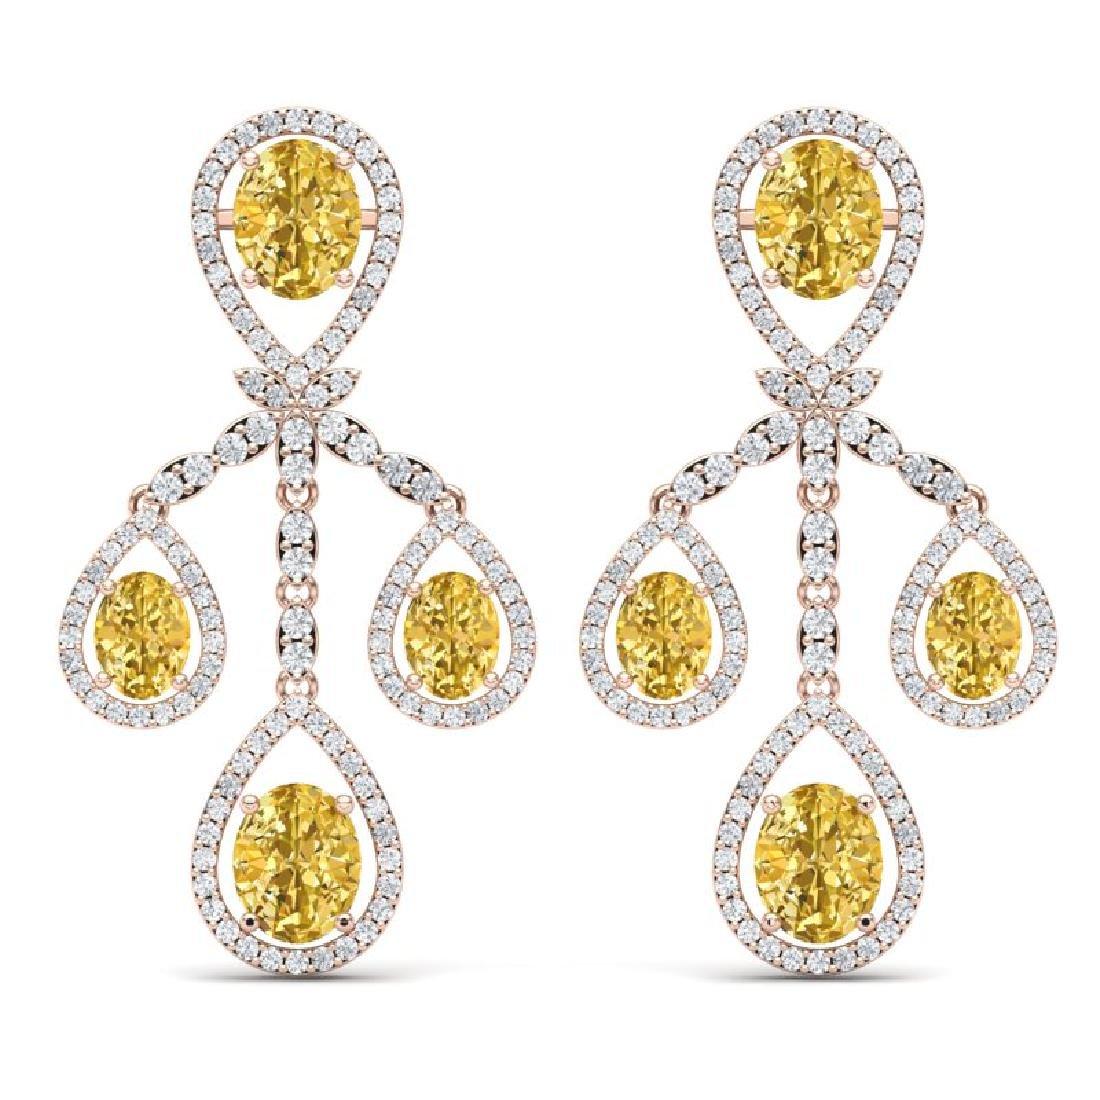 20.69 CTW Royalty Canary Citrine & VS Diamond Earrings